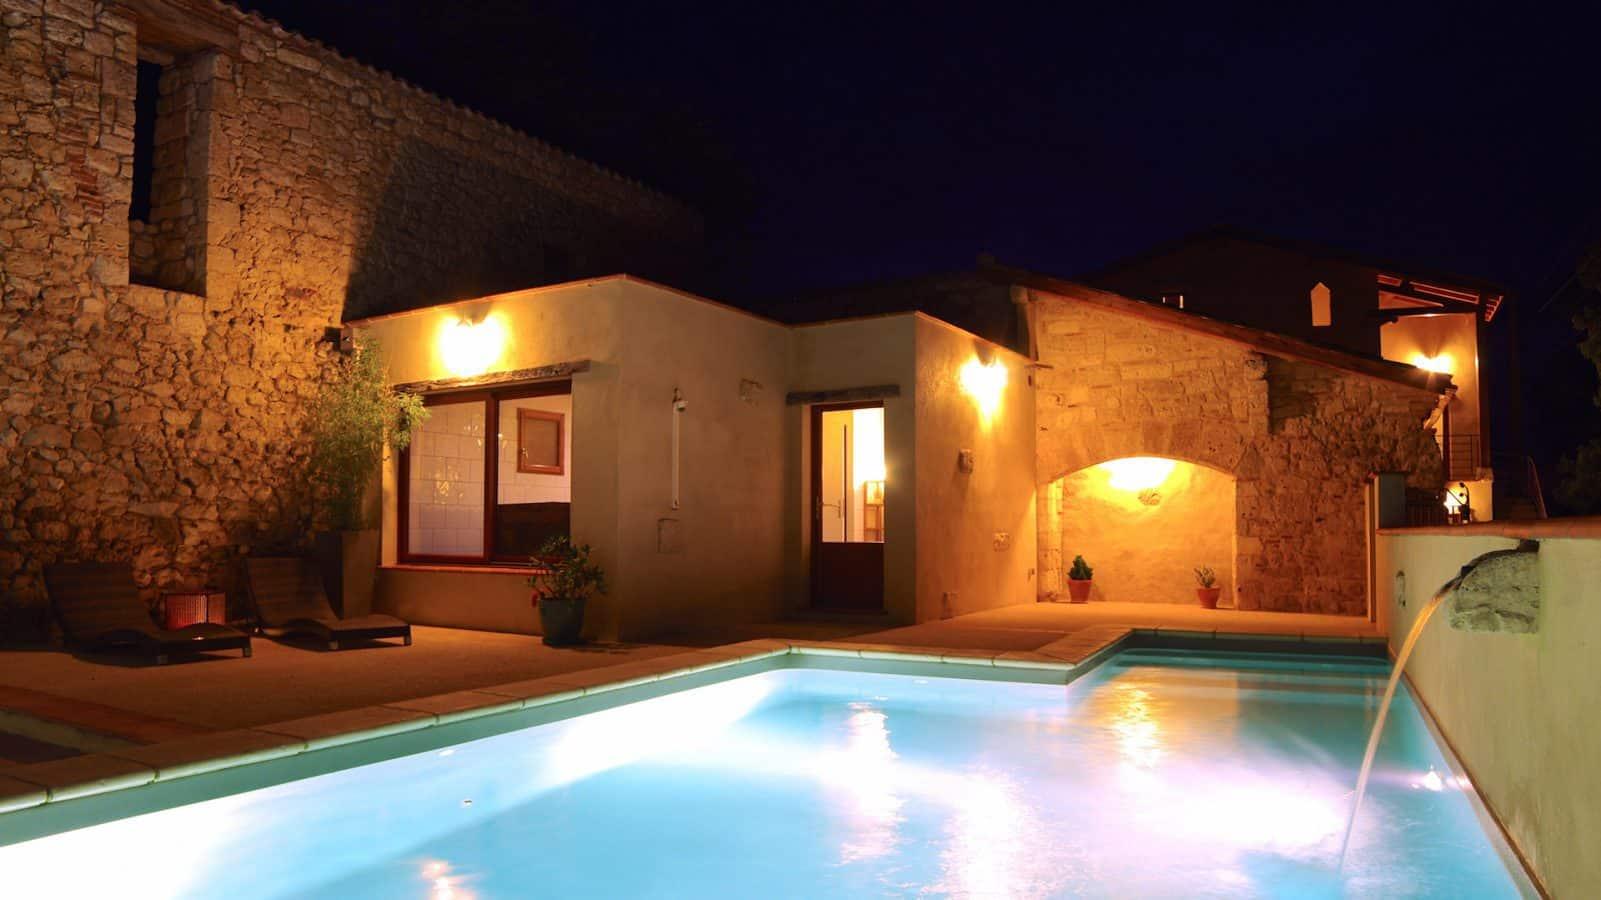 Espace d tente piscine et spa domaine de saussignac for Piscine sauna